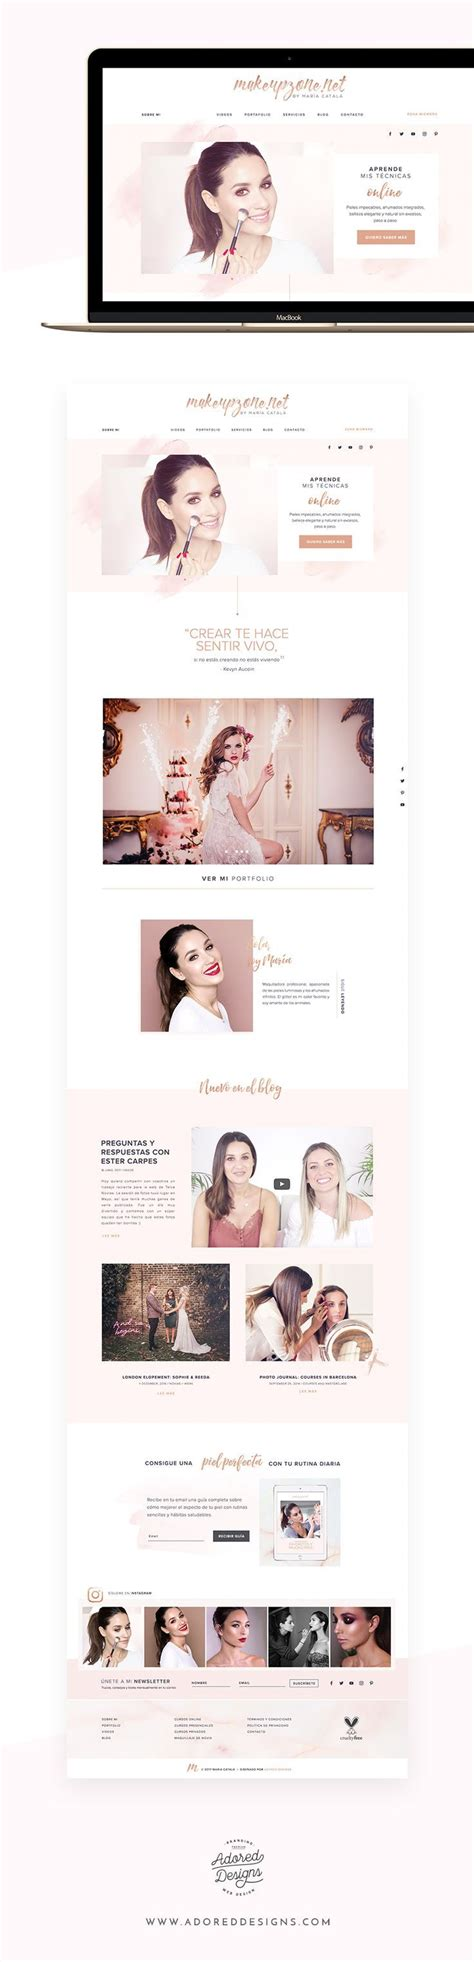 Makeupzone.net   Web Design for a Makeup Artist | Adored ...